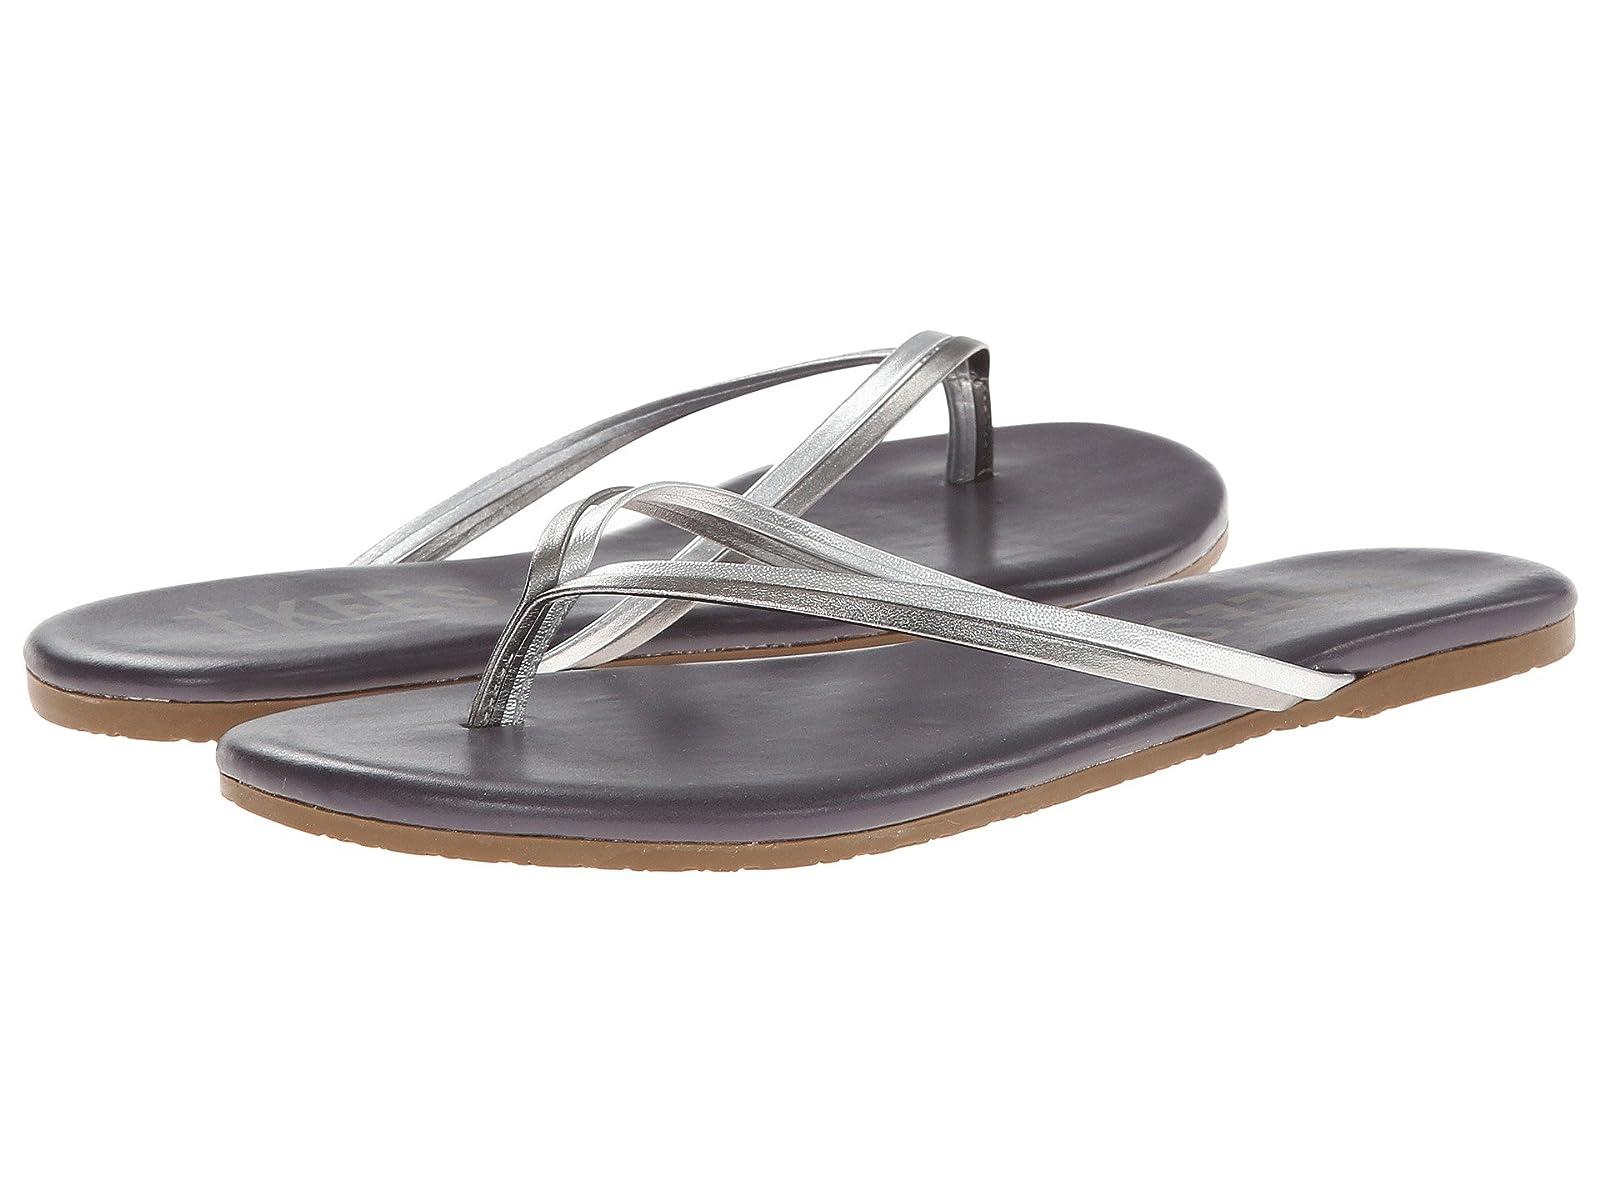 TKEES Flip-Flop-DuosAtmospheric grades have affordable shoes